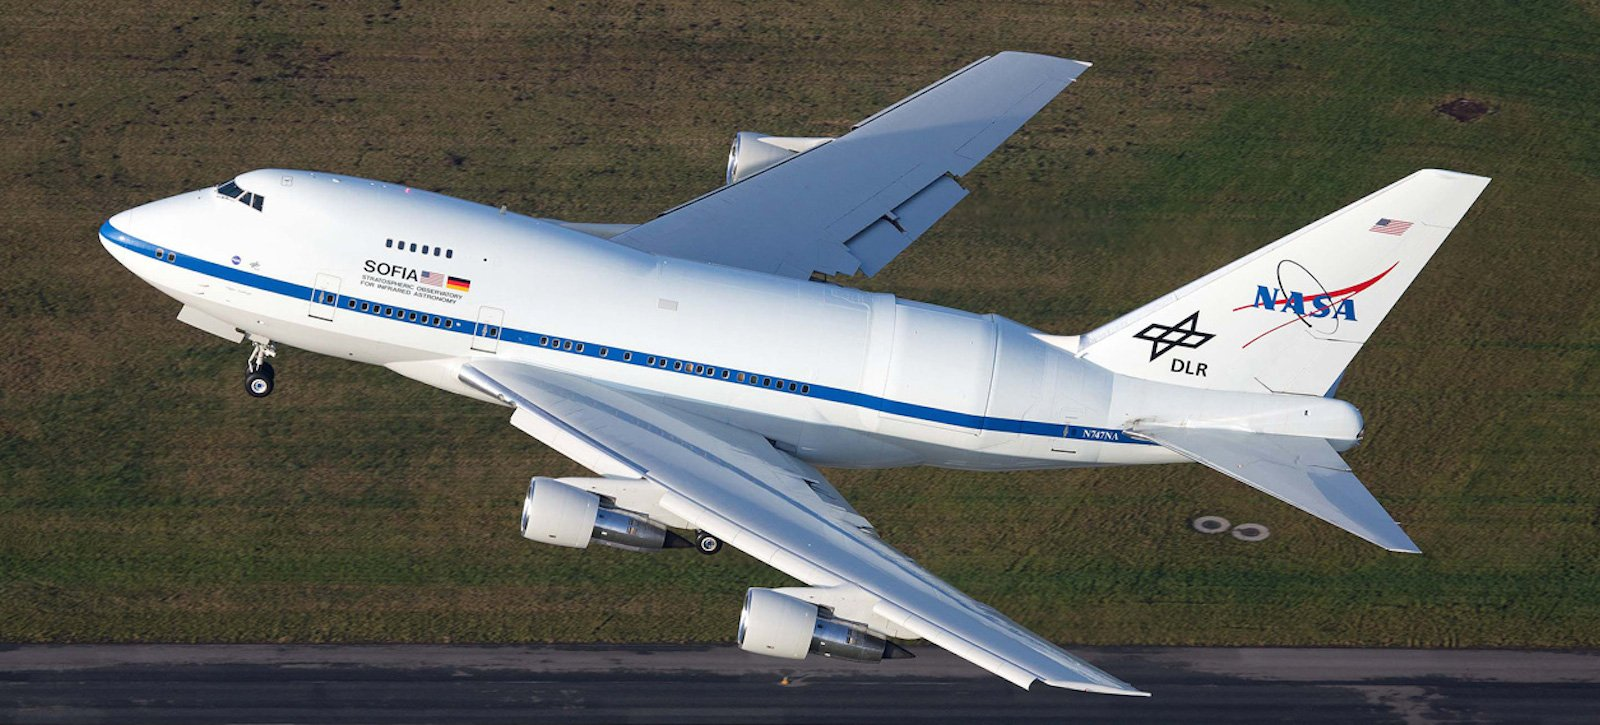 Rundumerneuerte SOFIA beim Abflug am 14. Dezember 2014.